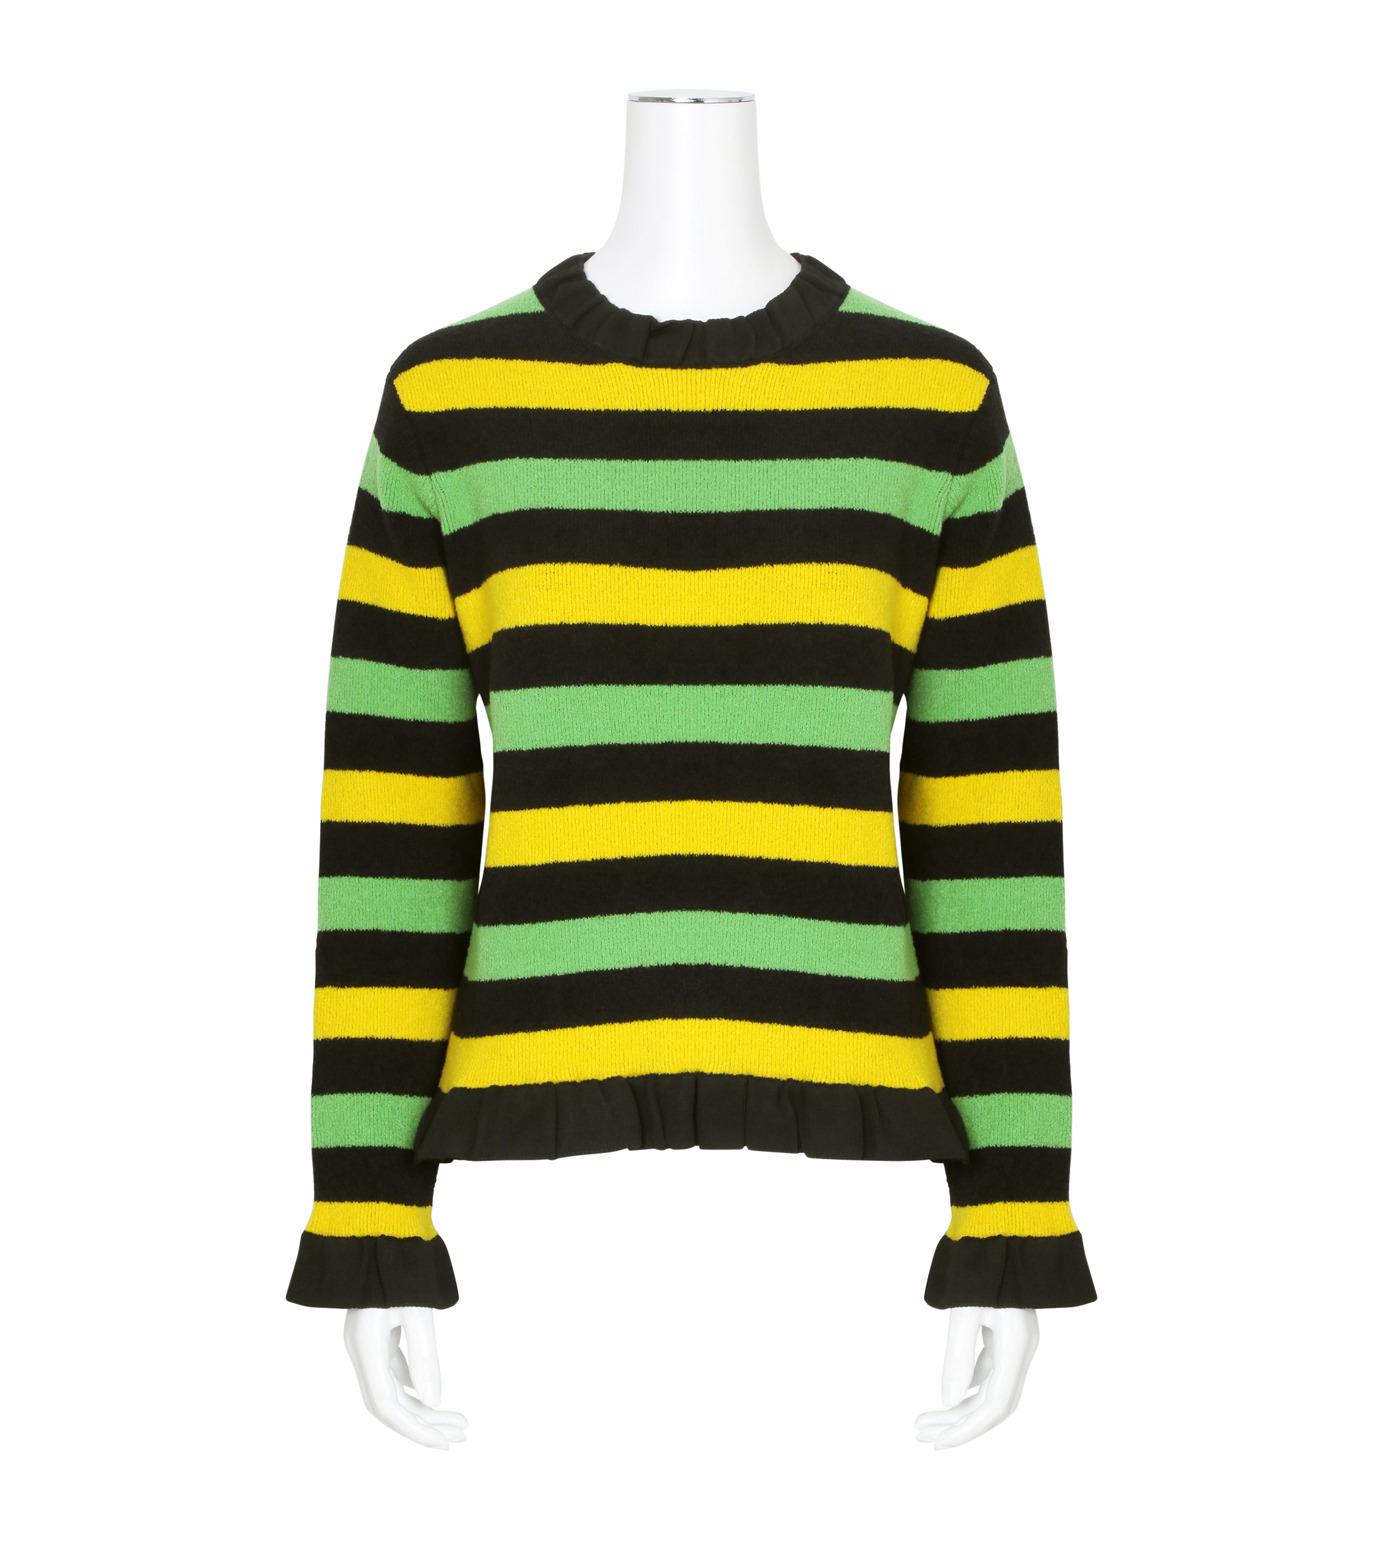 J.W.Anderson(ジェイダブリュー アンダーソン)のStriped Boucle Sweater-GREEN(ニット/knit)-KW11-22 拡大詳細画像1